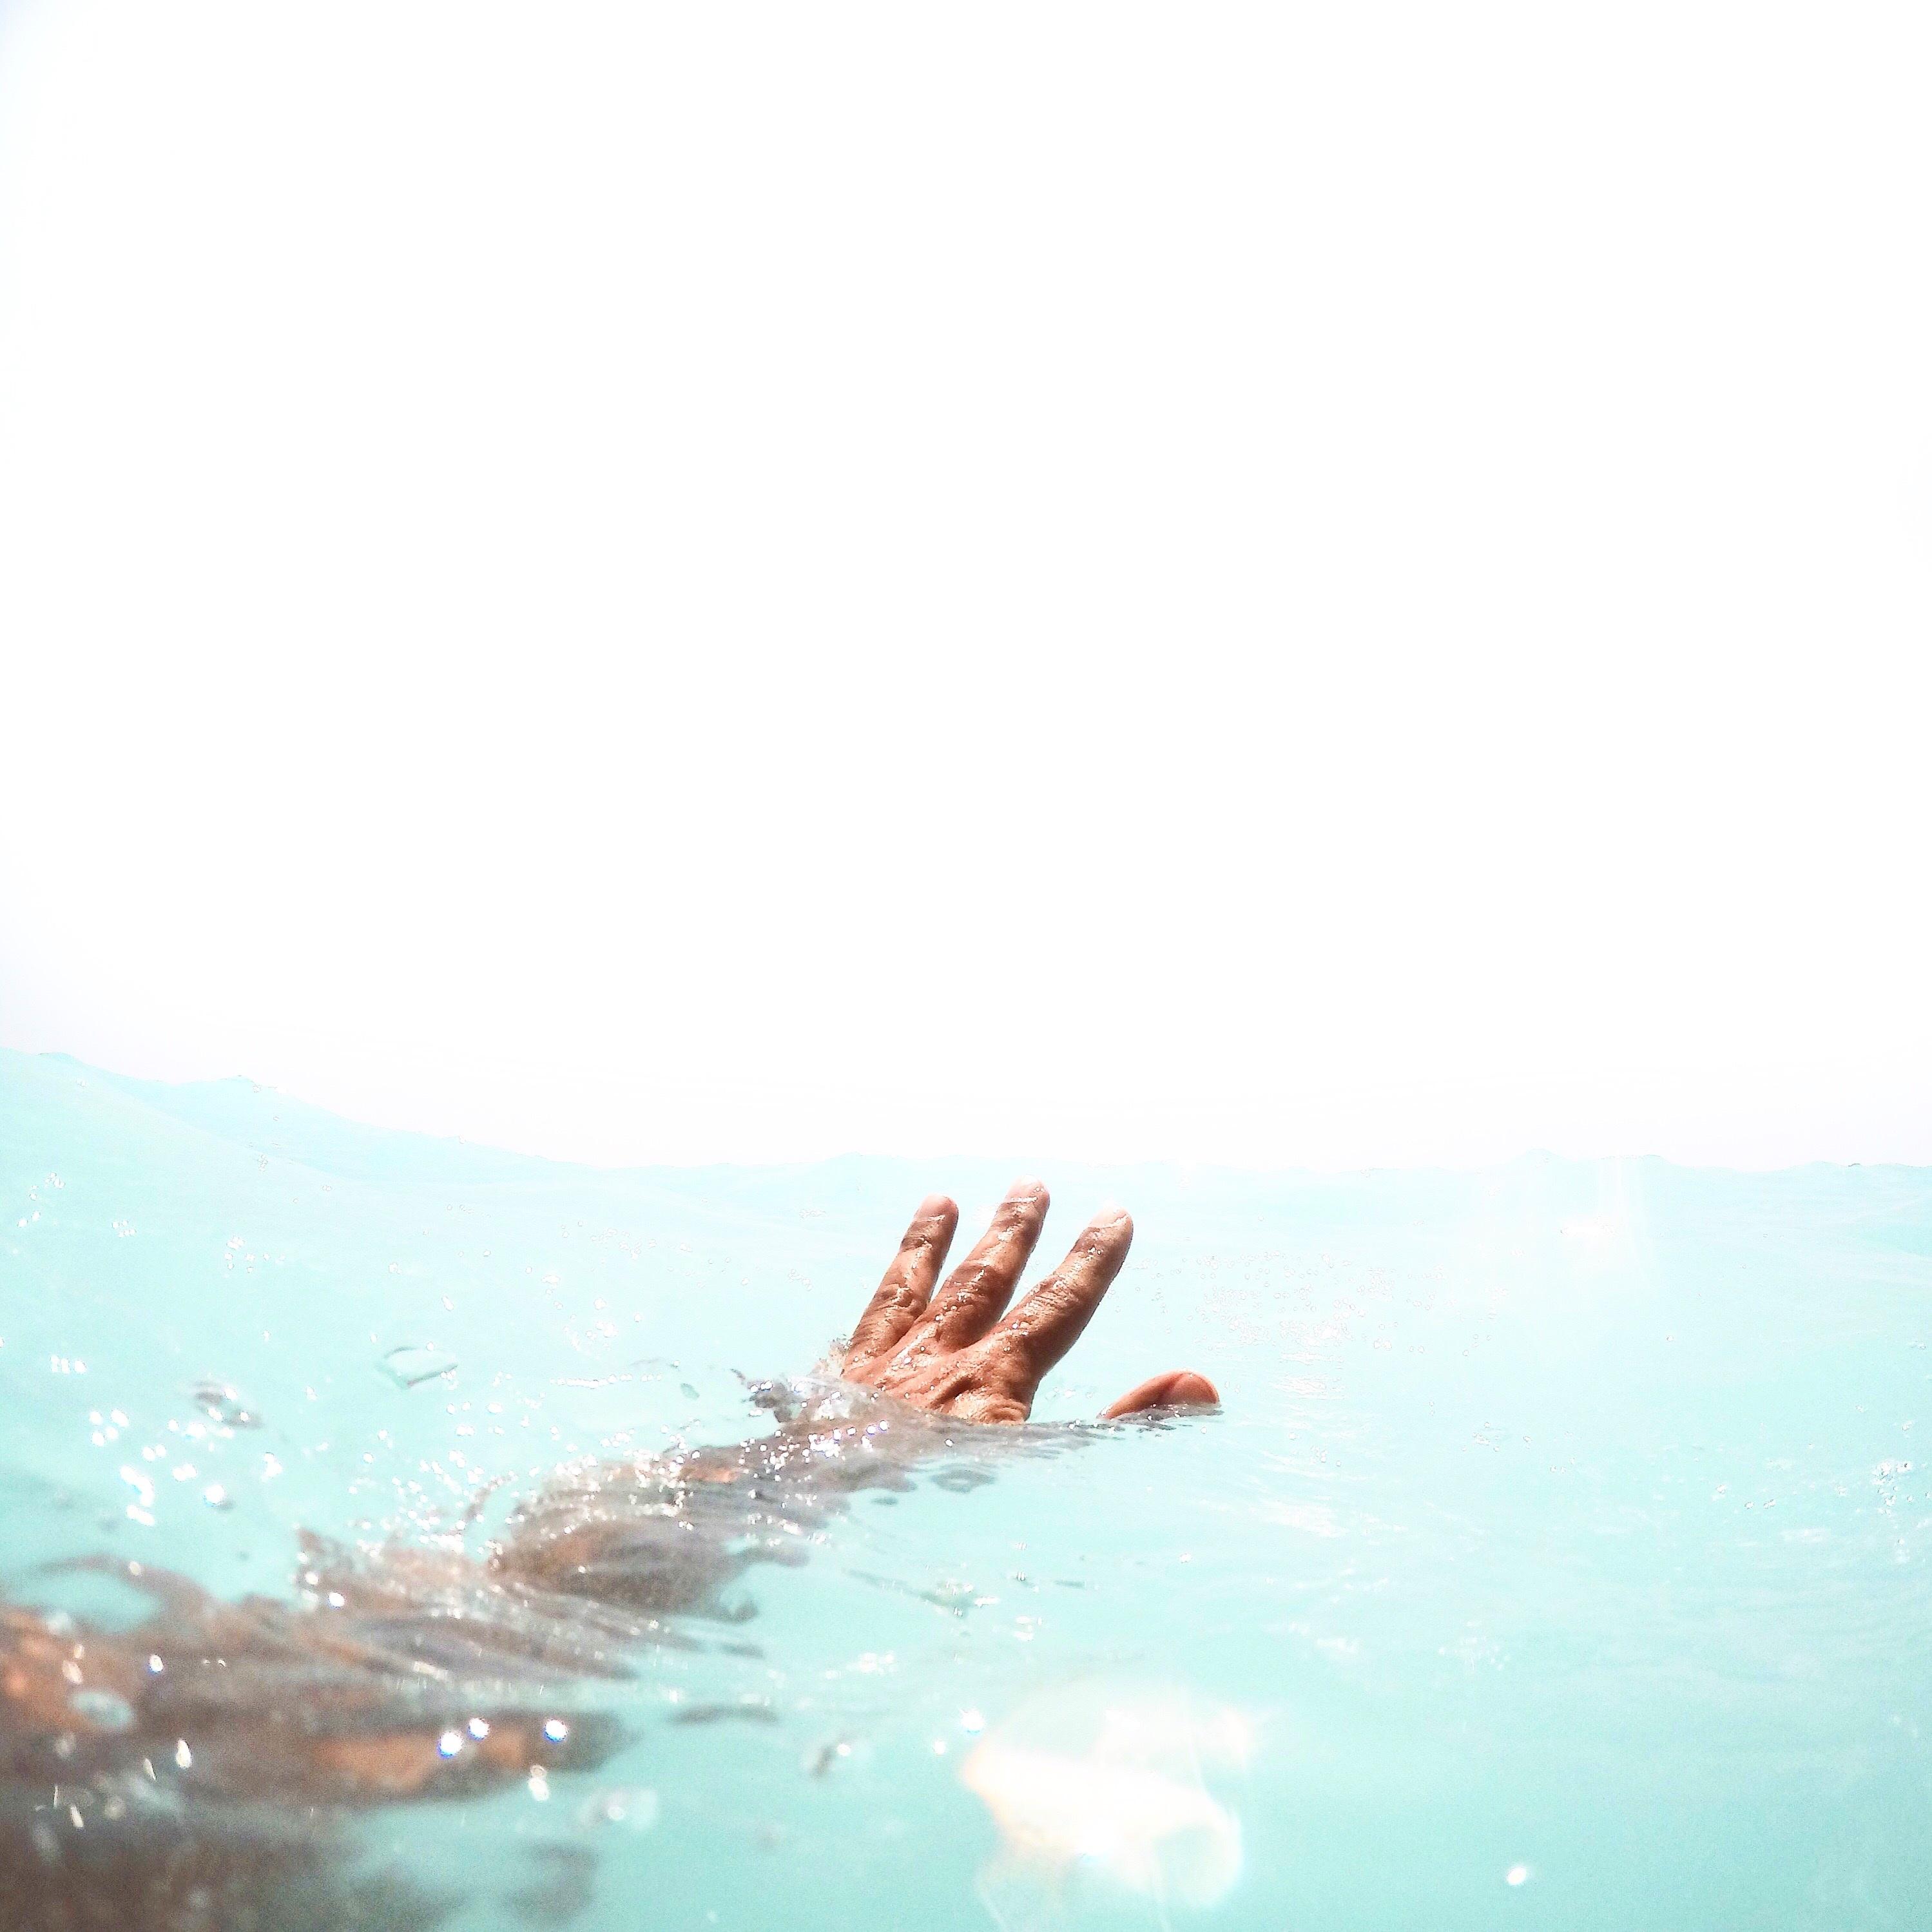 summer outdoors wallpaper. Hand Beach Sea Water Ocean Light Sky Sunlight Wave Wet Summer Vacation Underwater Swimming Pool Calm Outdoors Wallpaper O